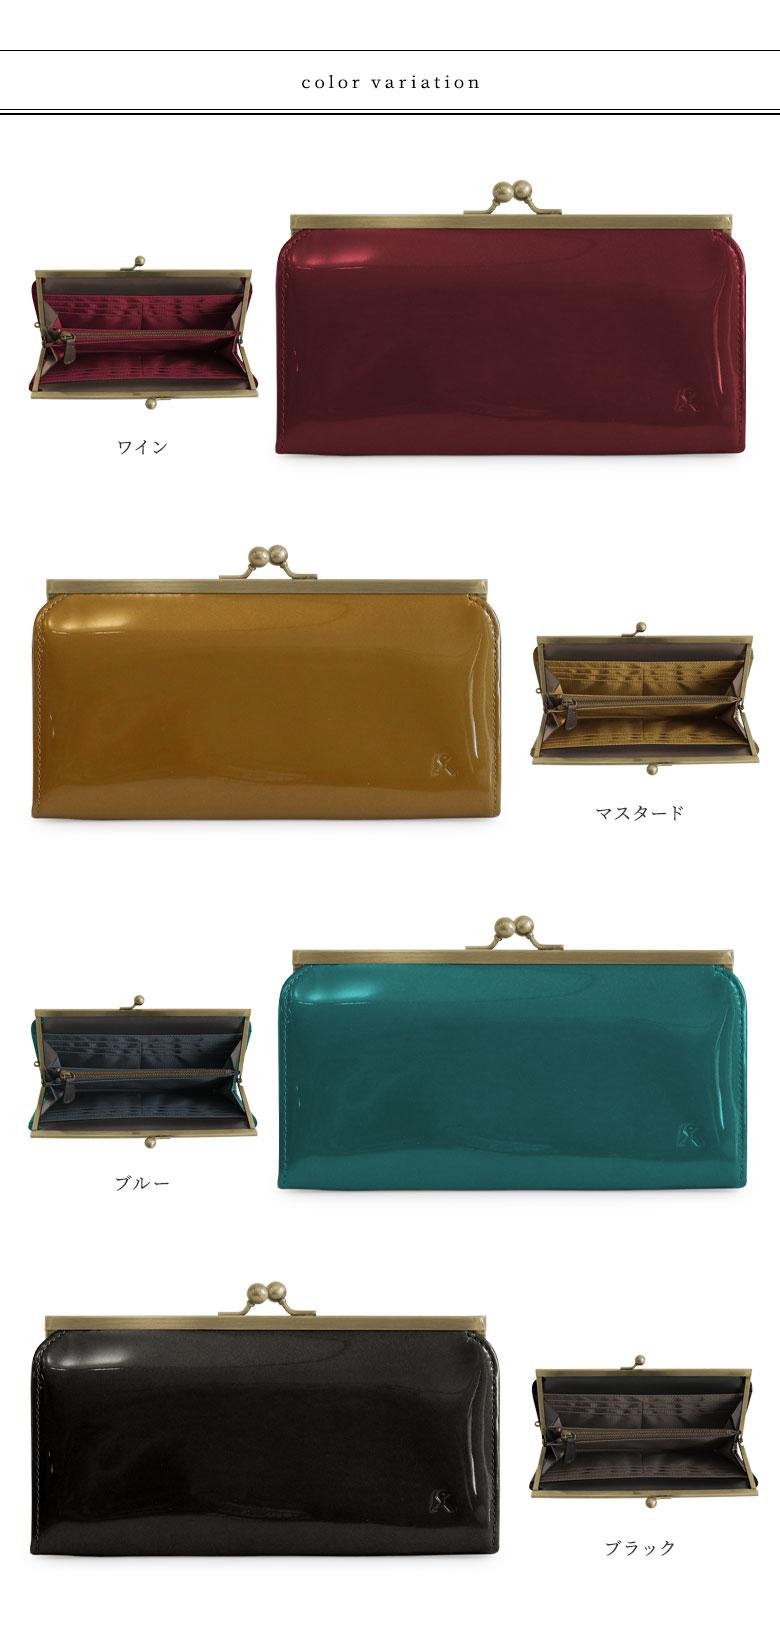 AYANOKOJI X(あやの小路 イックス) 外がま口長財布 メタリックエナメル(本革) 色展開 カラーバリエーション画像